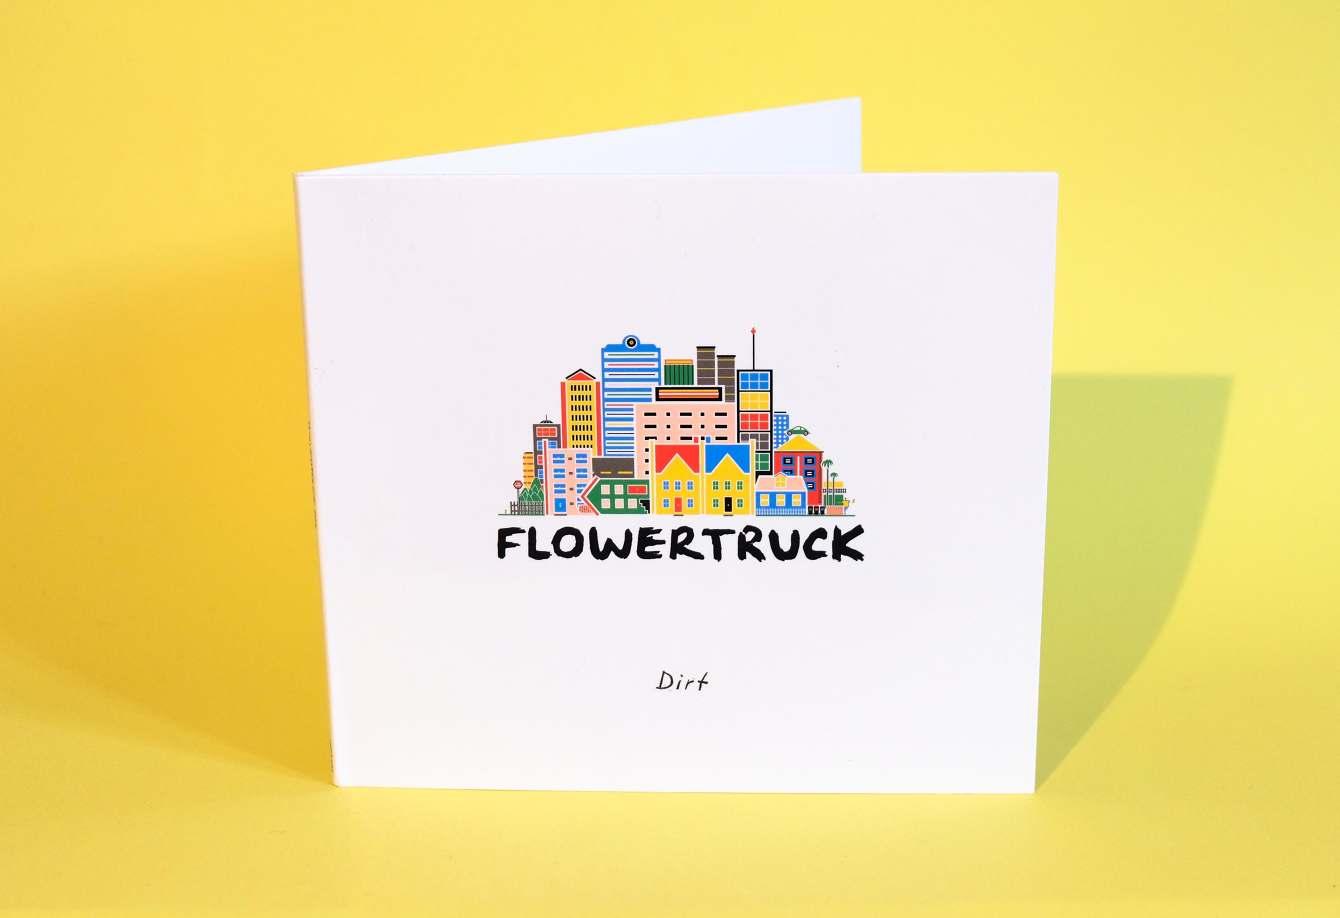 Flowertruck EP 'Dirt' album cover design